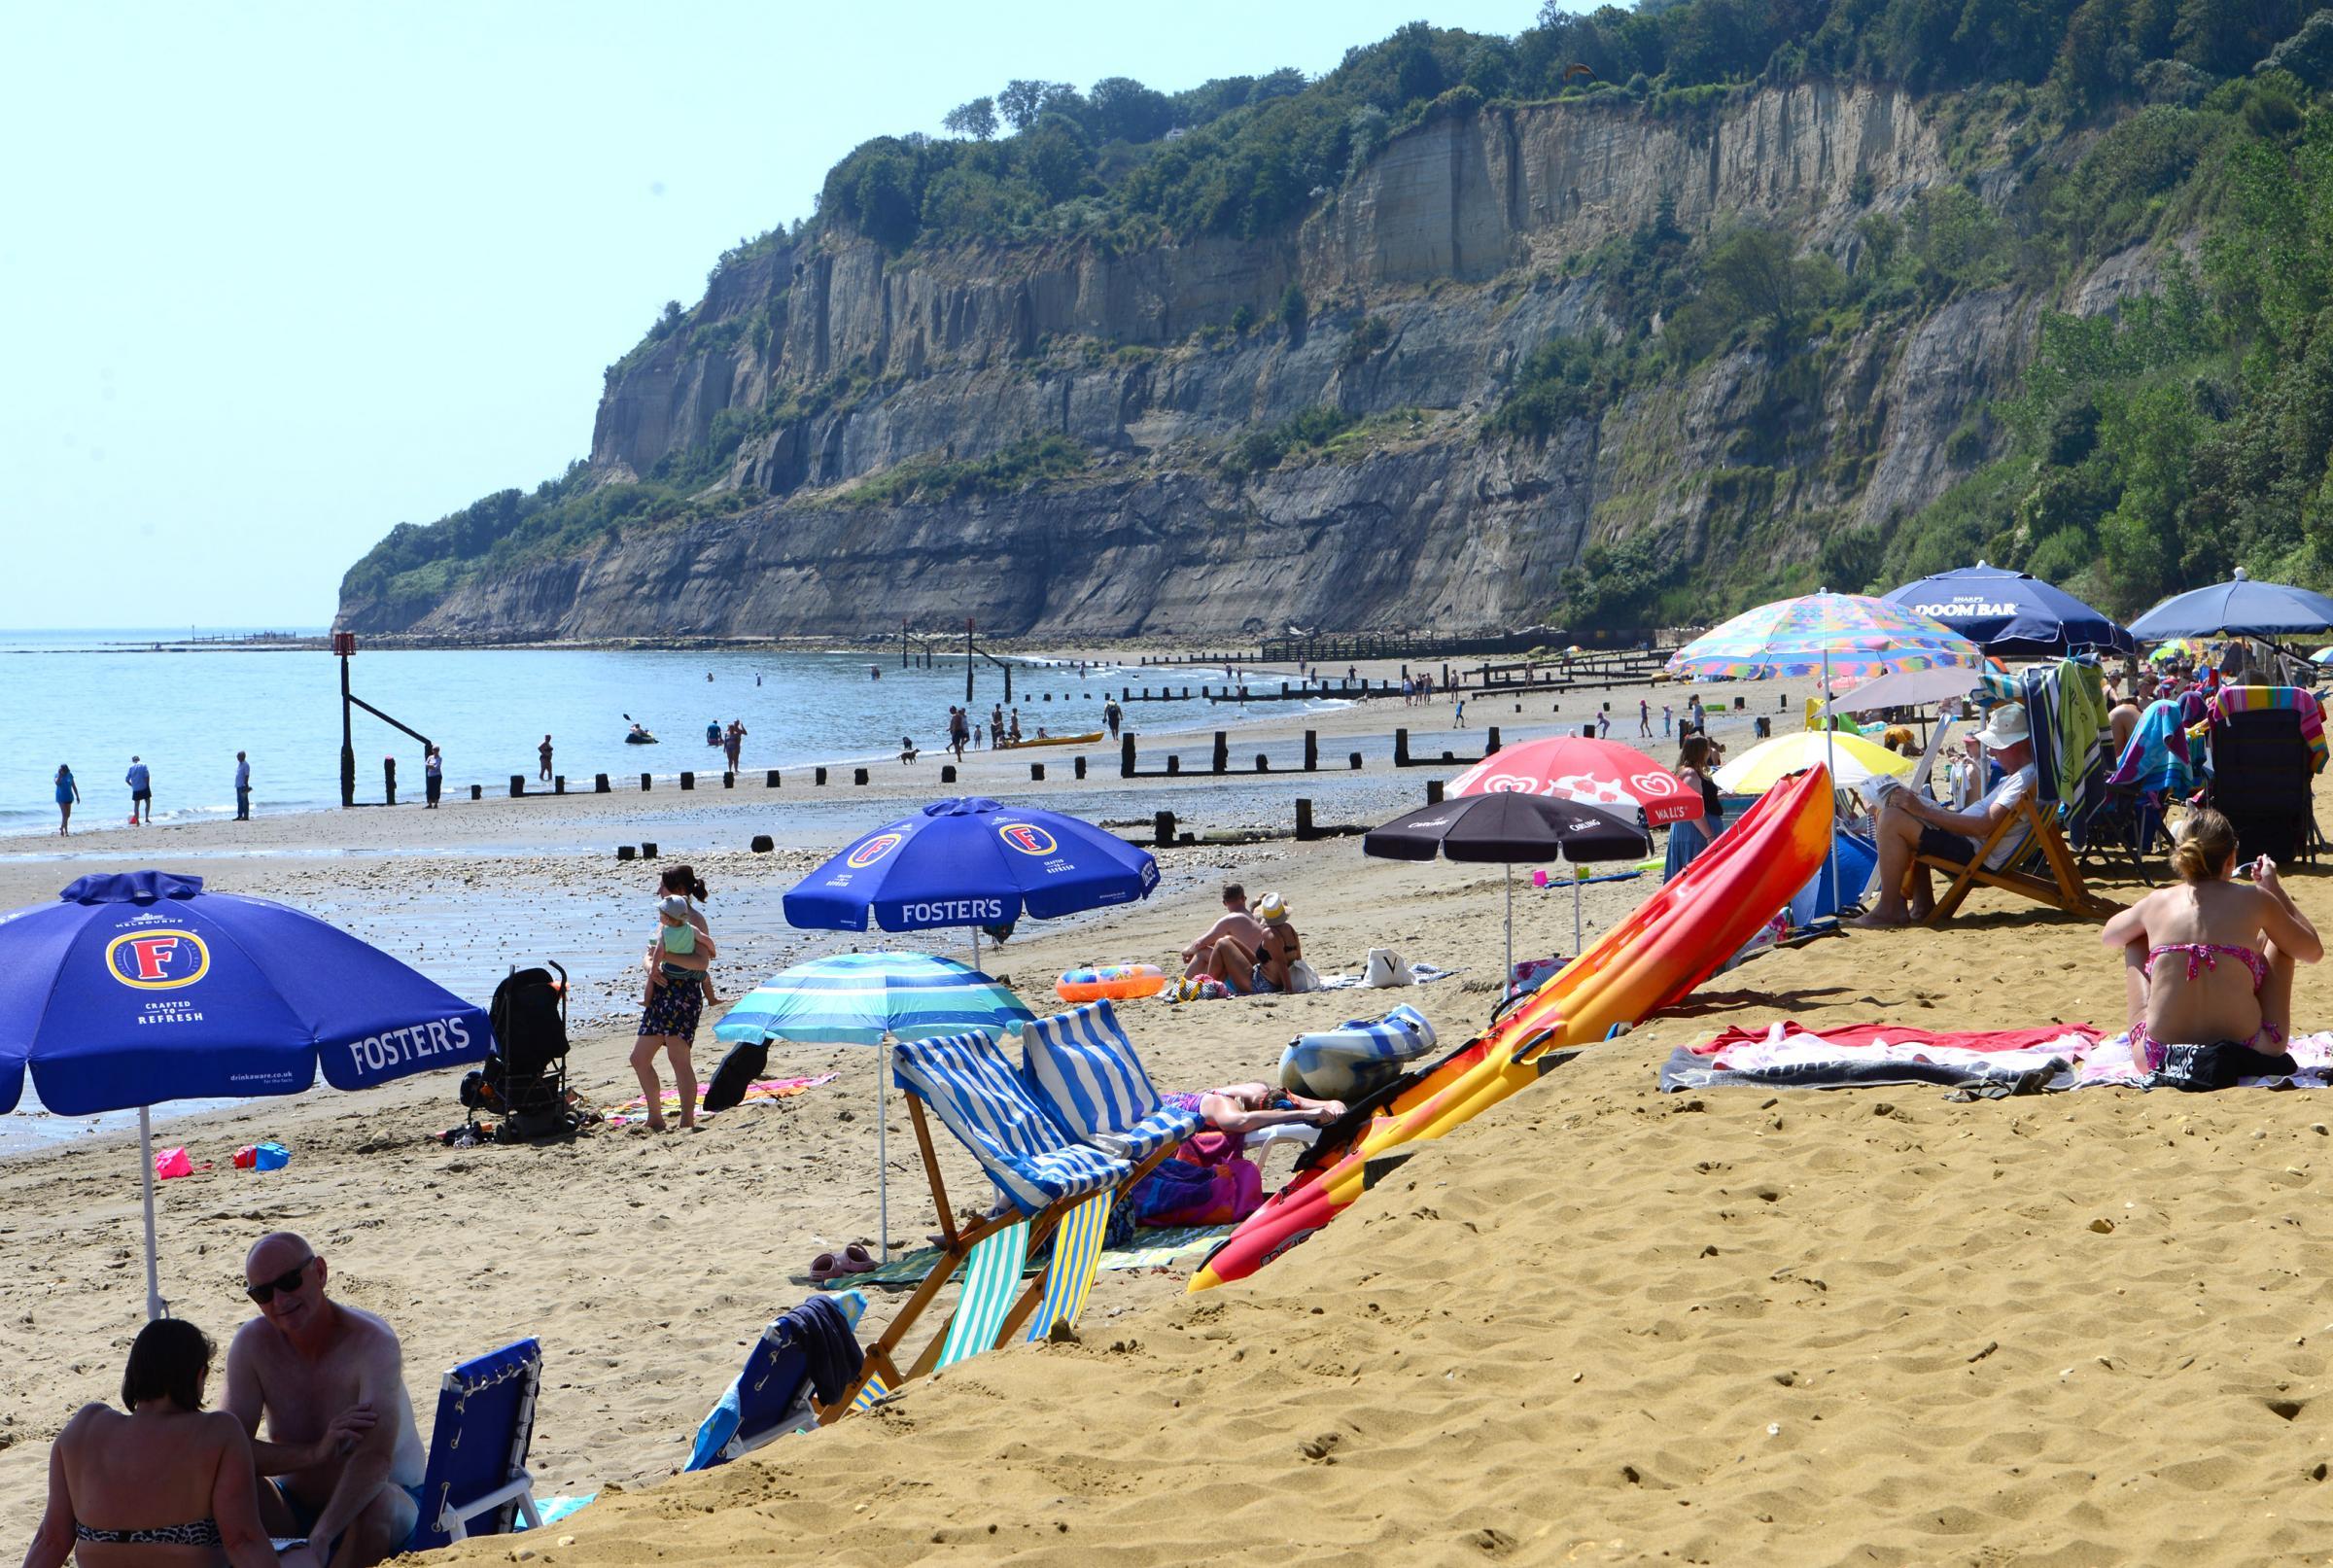 Isle of Wight emergency services called to landslip near Shanklin Esplanade